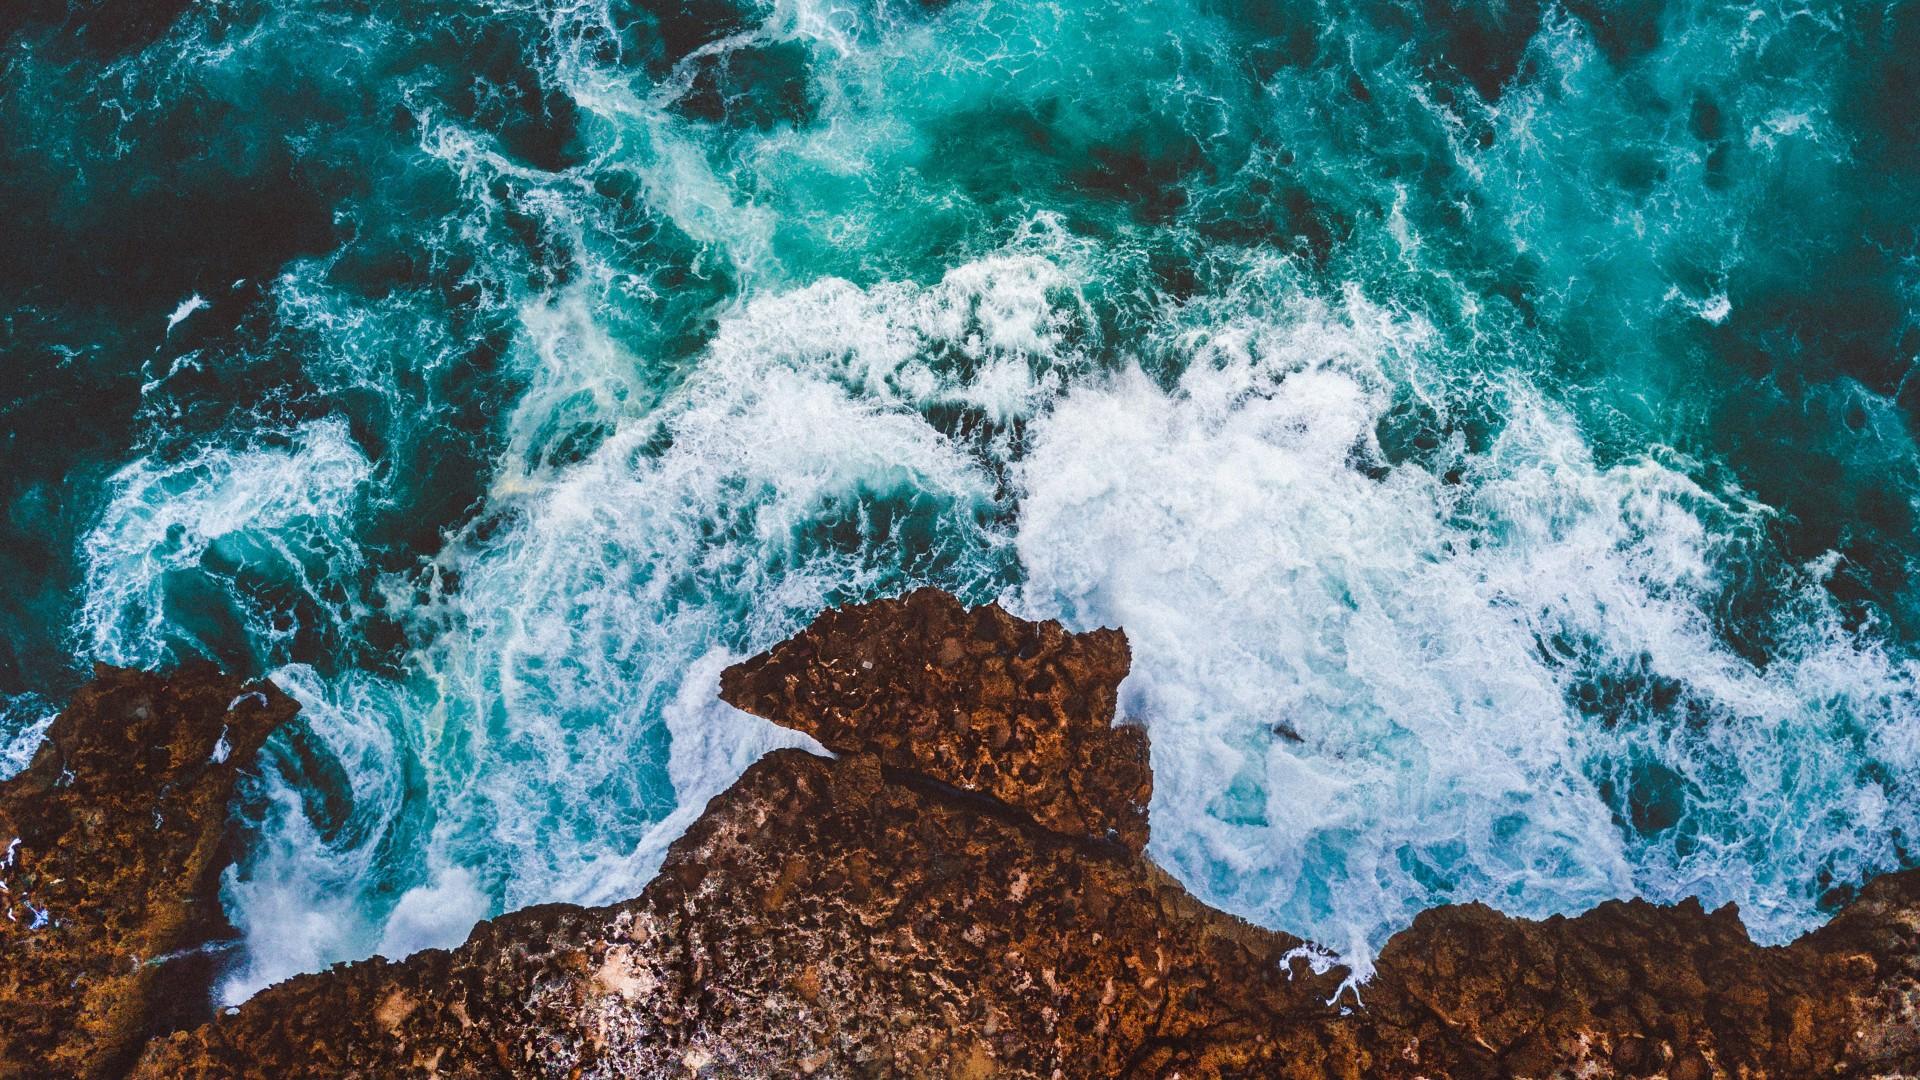 Fall Beach Widescreen Wallpaper Ocean Cliff Drone View 4k Wallpapers Hd Wallpapers Id